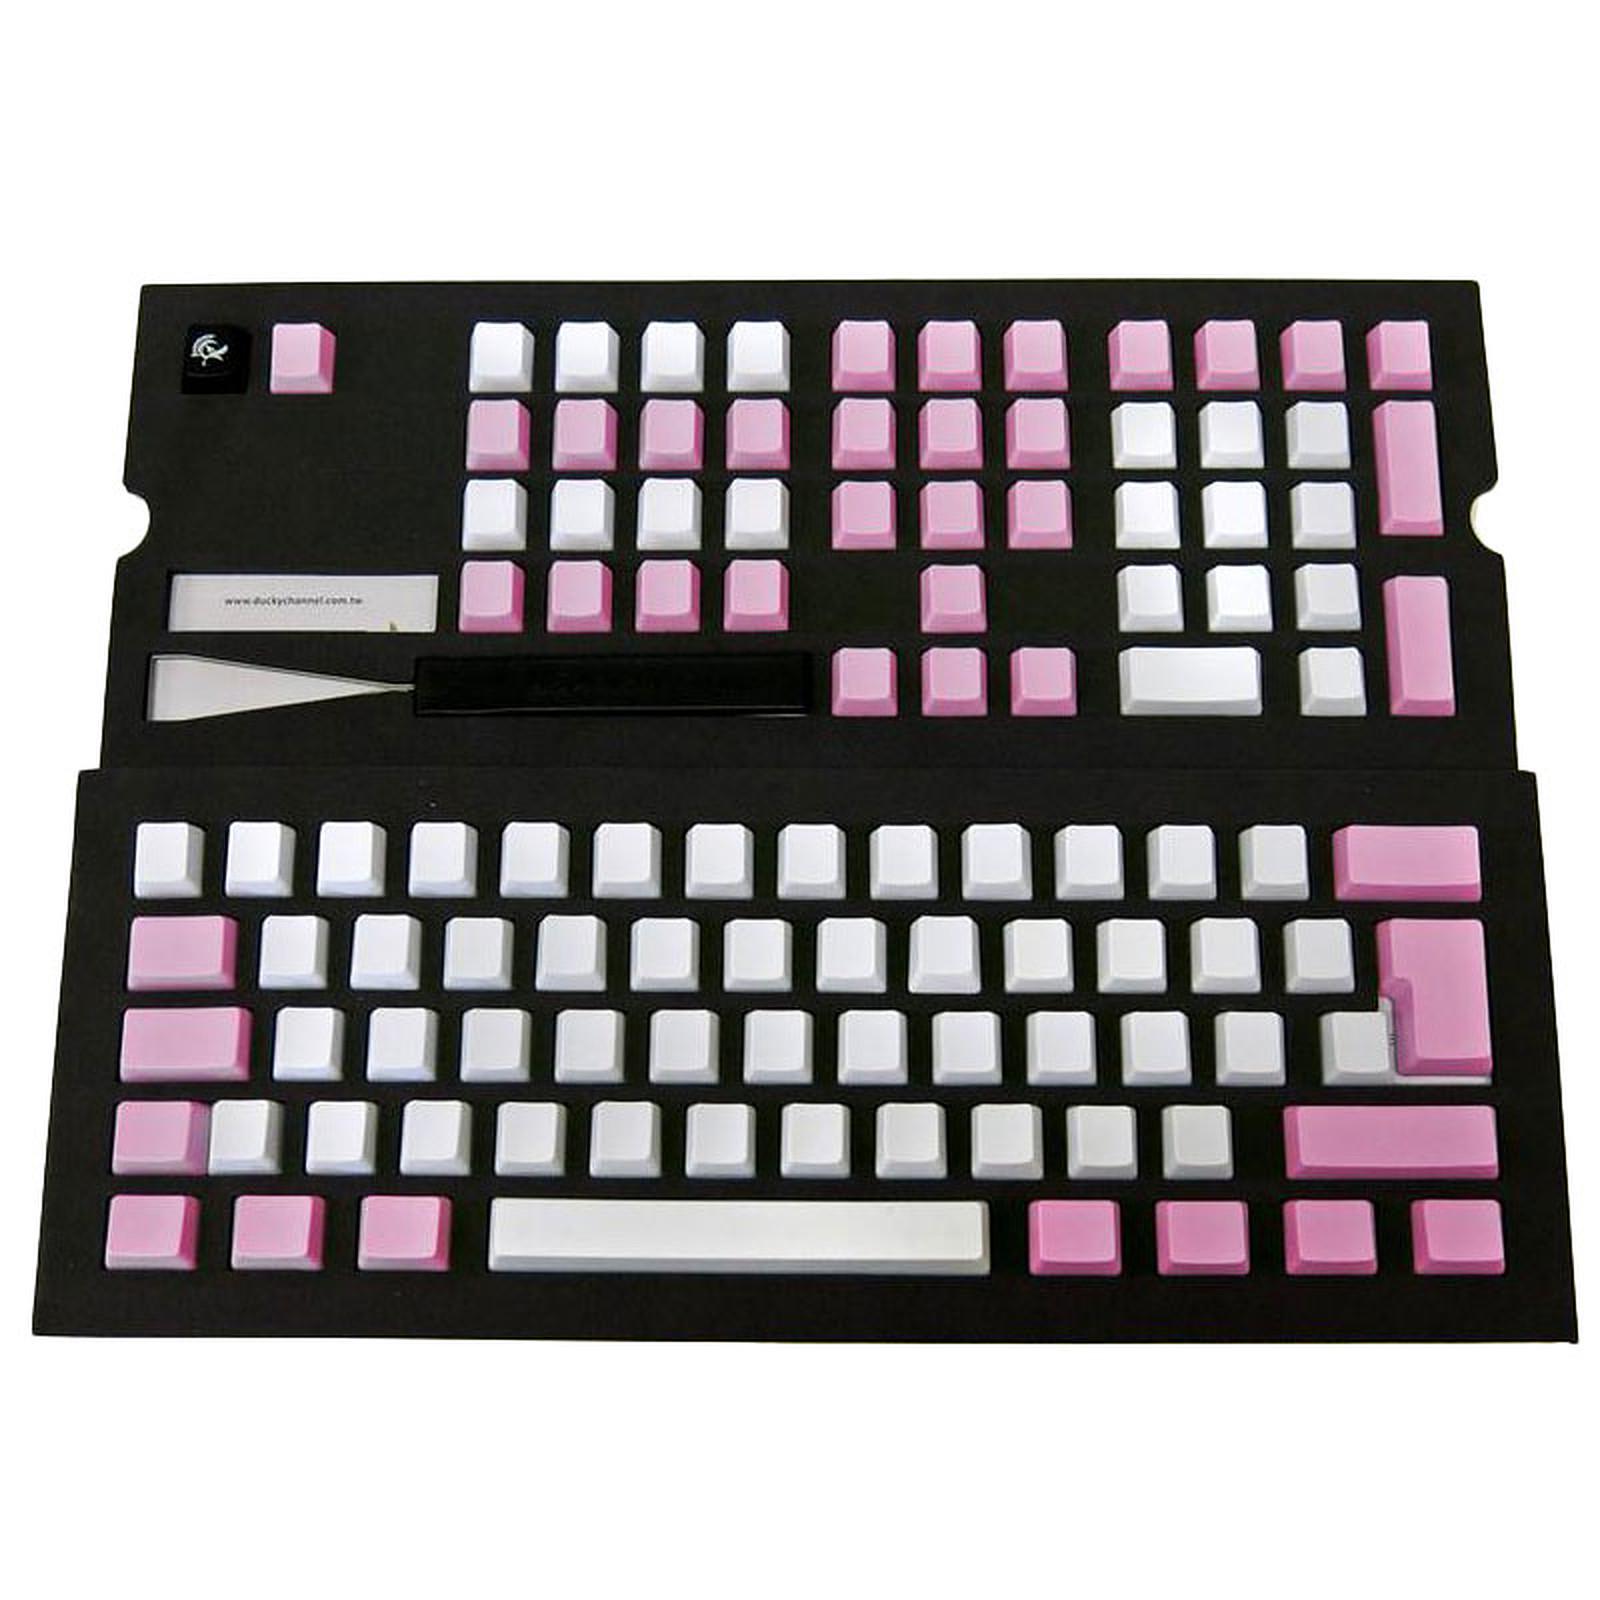 Ducky Channel Keycap Set (blanc / rose)